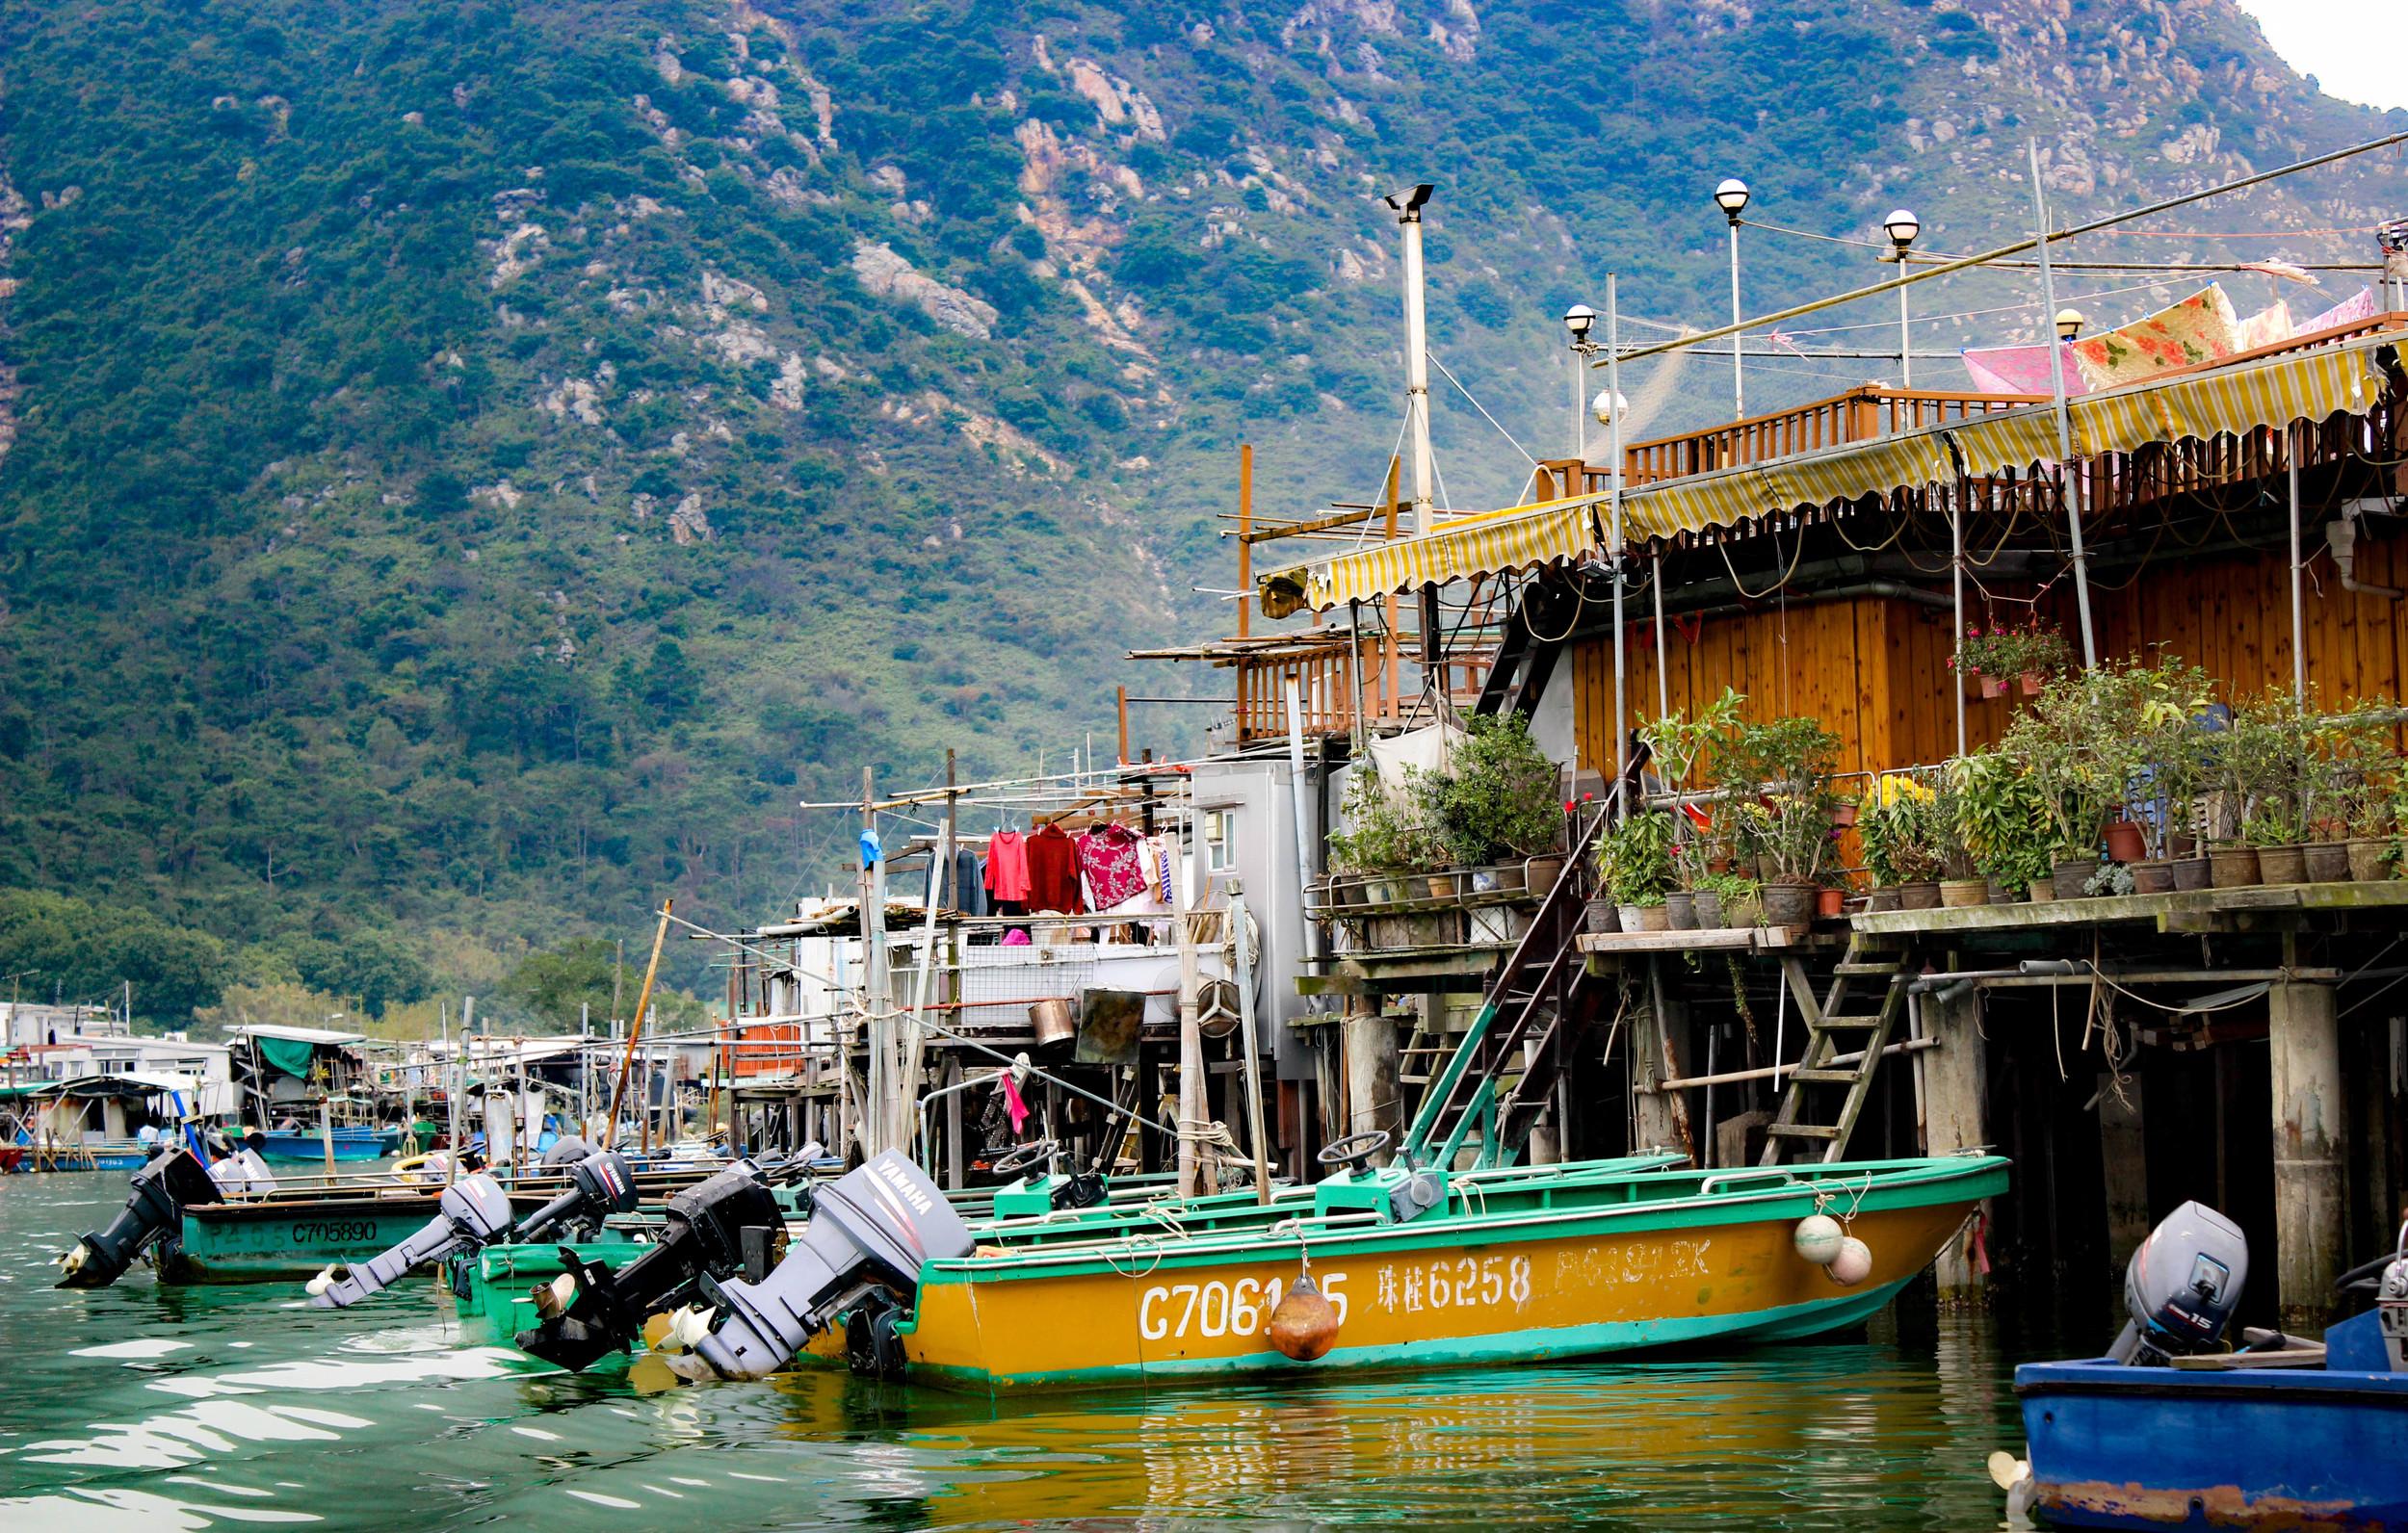 EXPLORING HONG KONG: OUR TOP EXPERIENCES